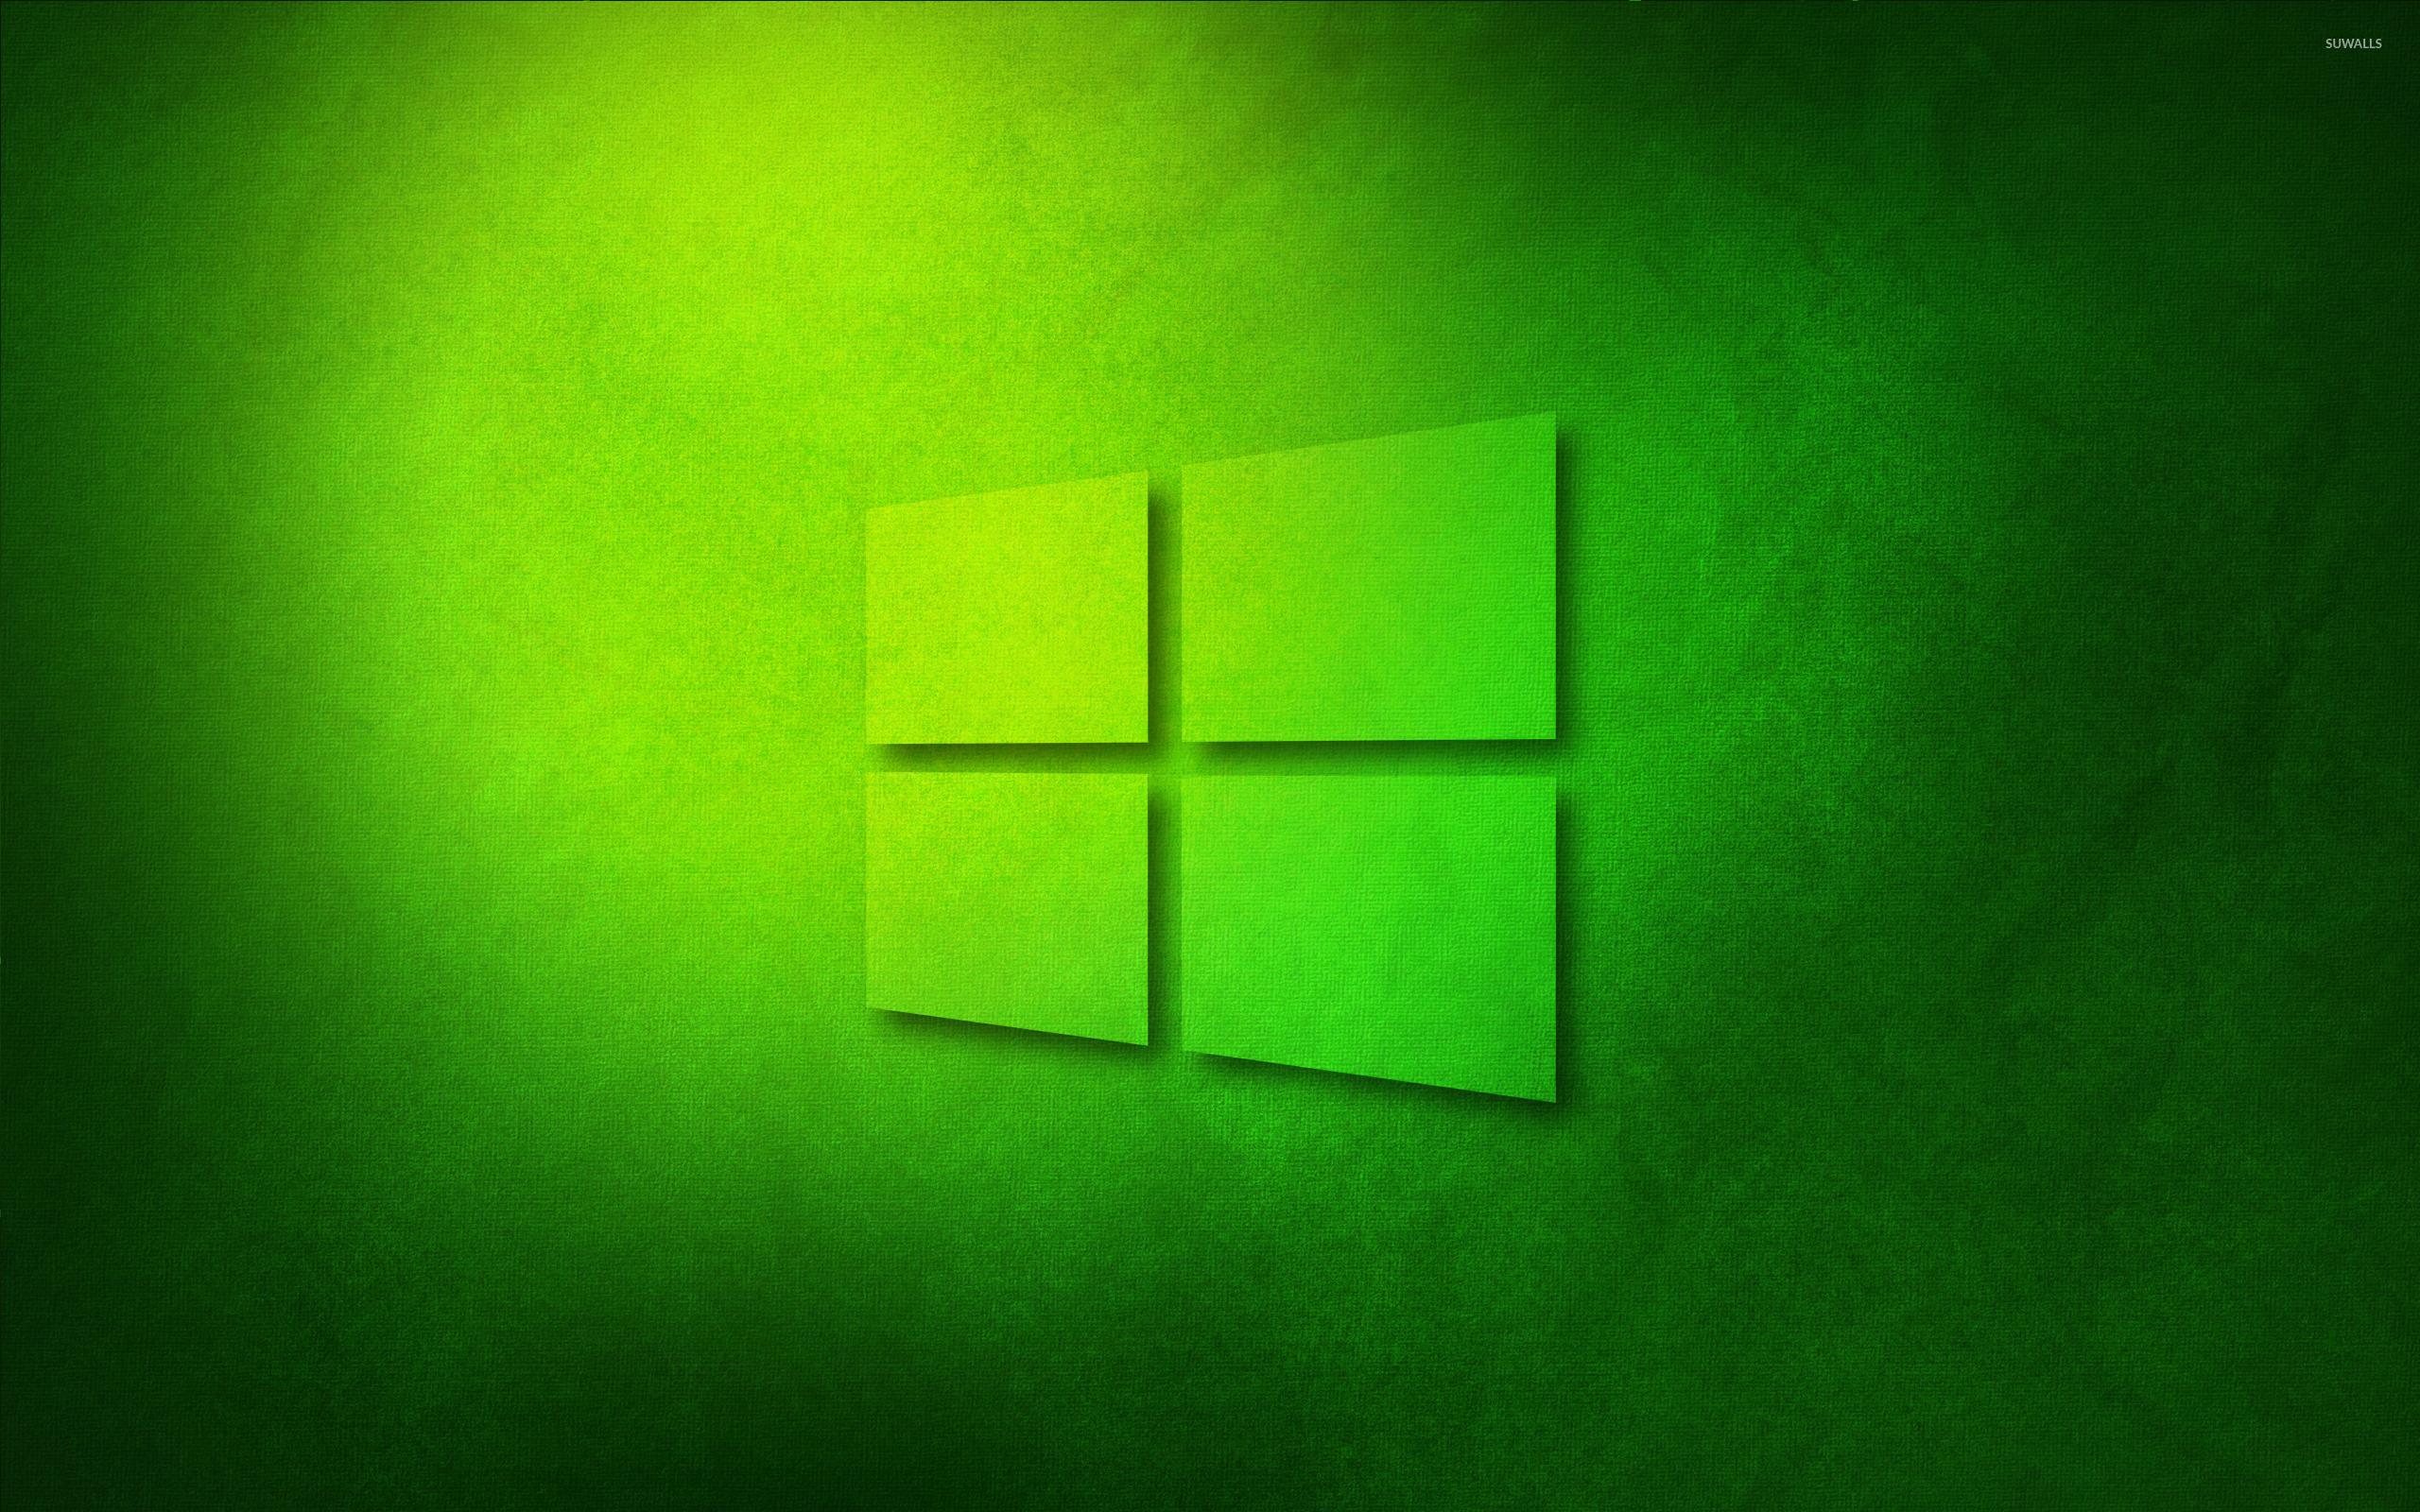 Windows 10 transparent logo on green paper wallpaper for Window 10 wallpaper